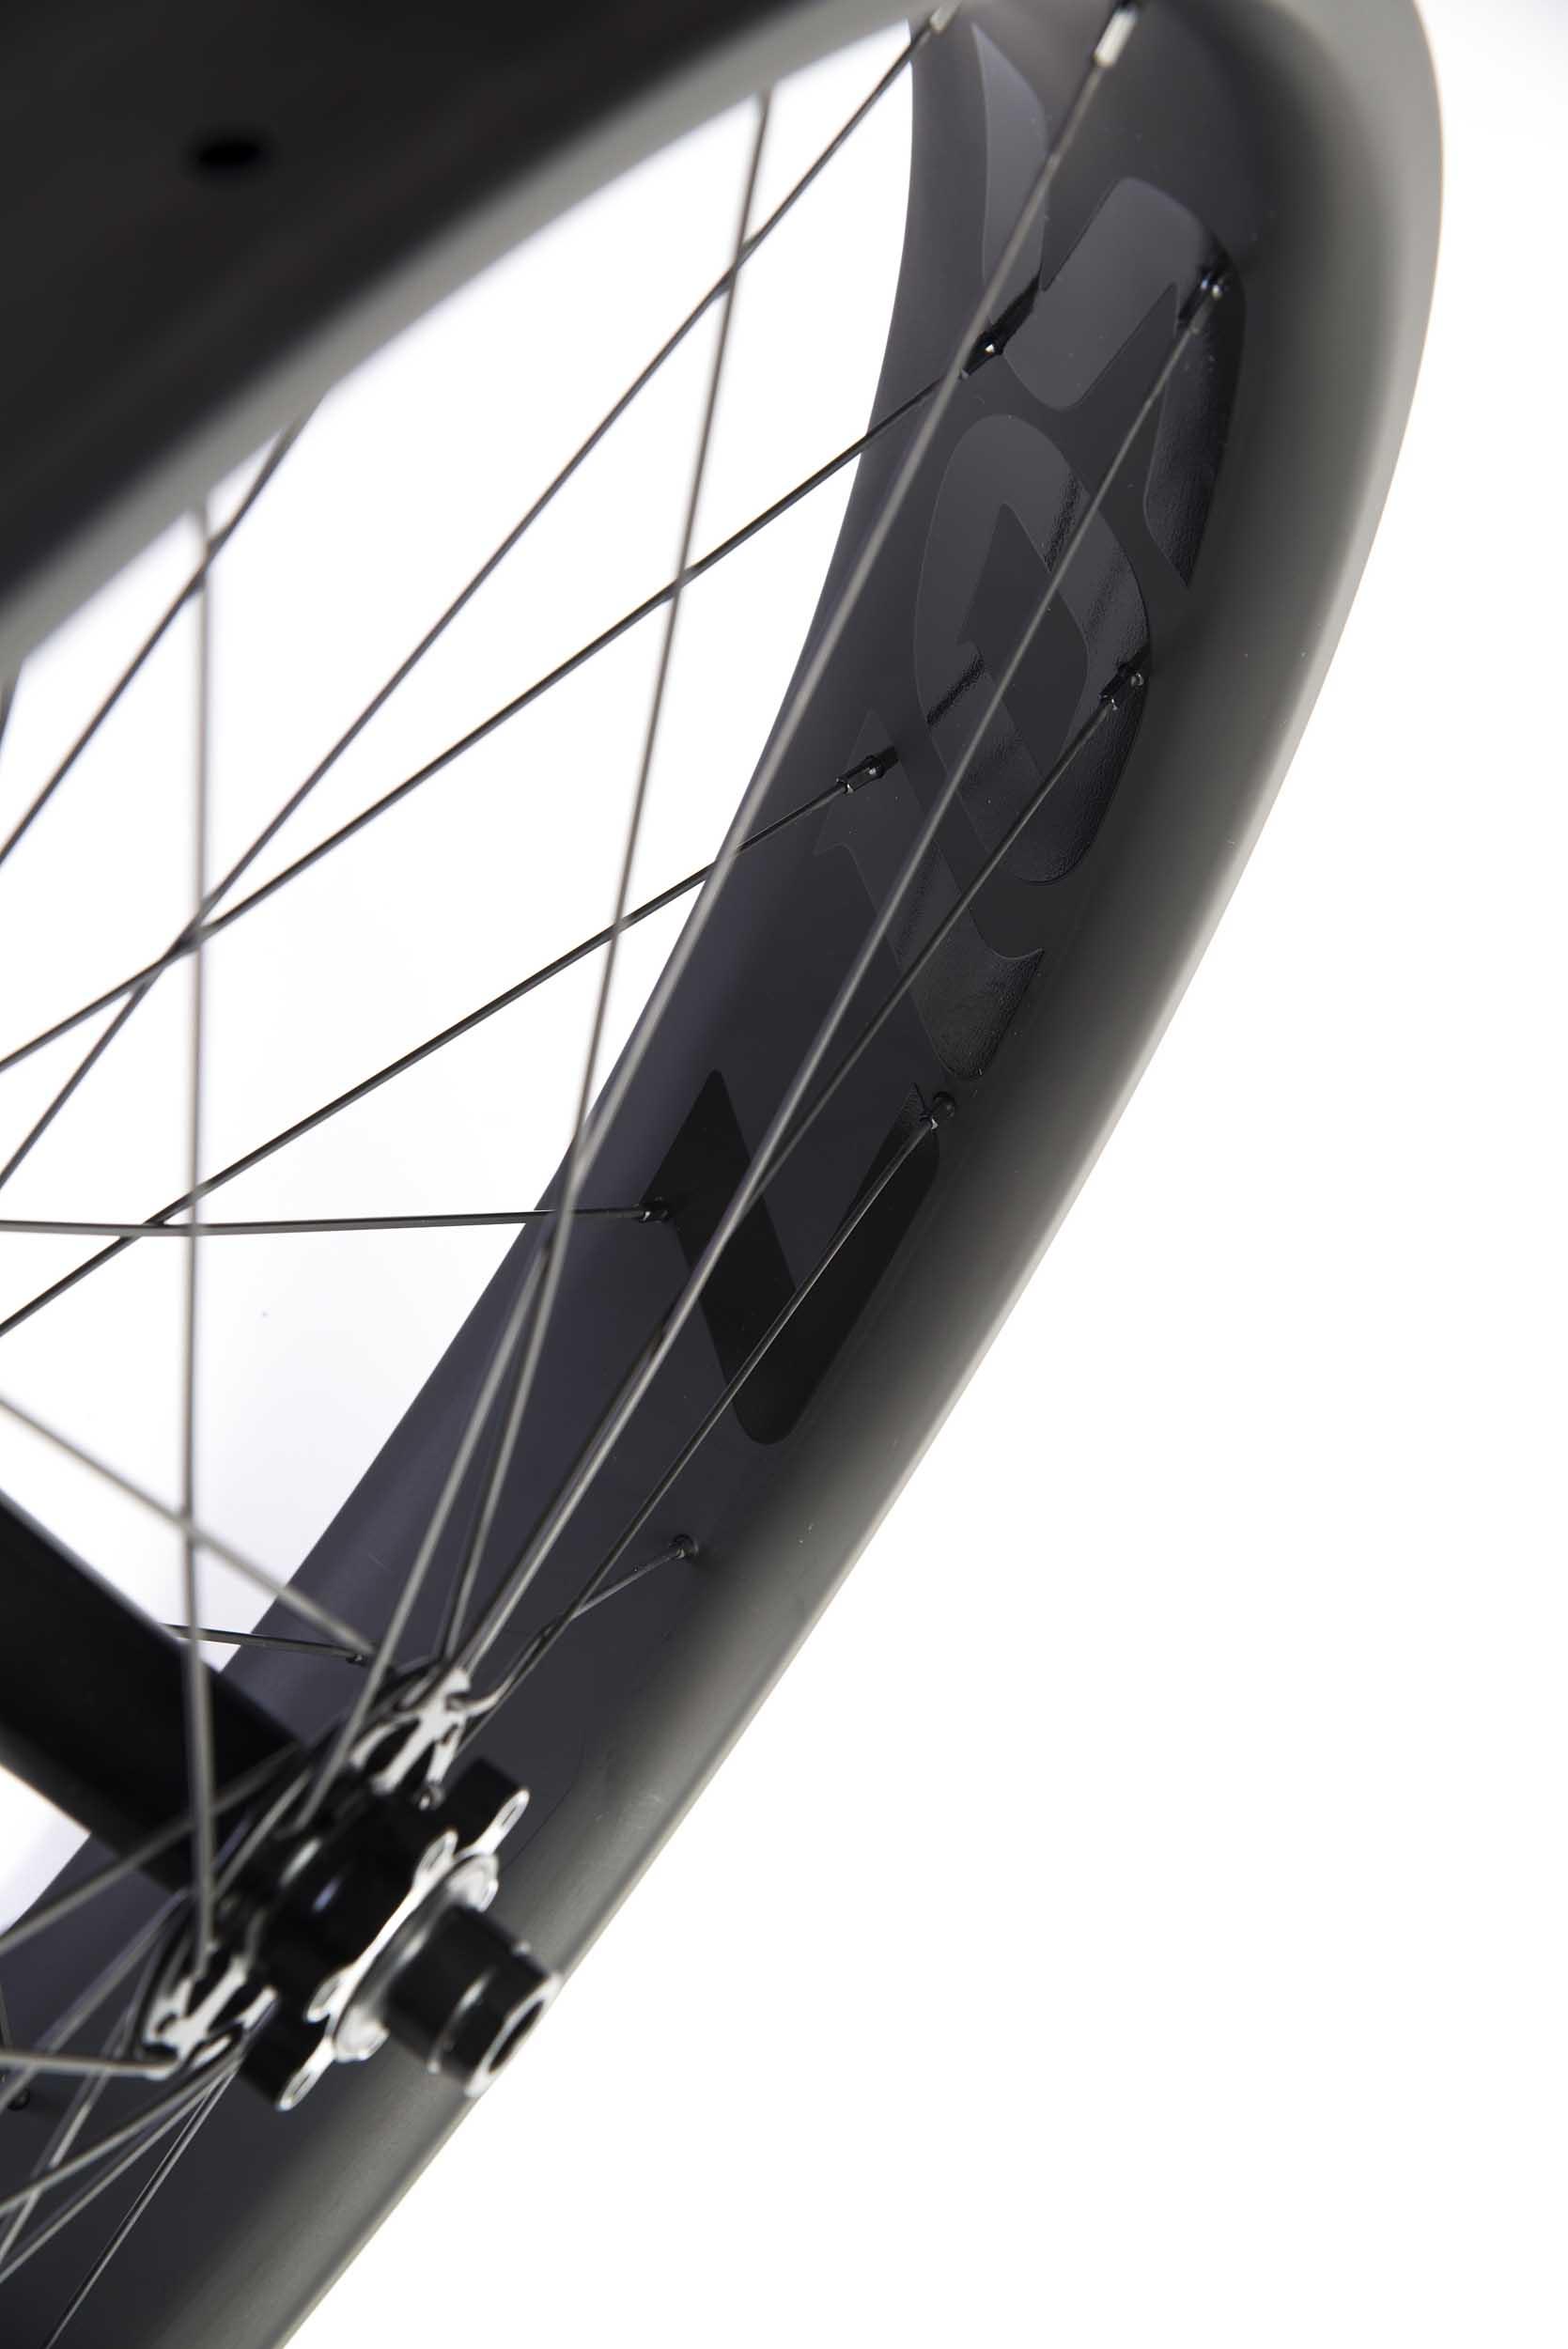 lios-carbon-fatbike-wheelset-black-image-5.jpg